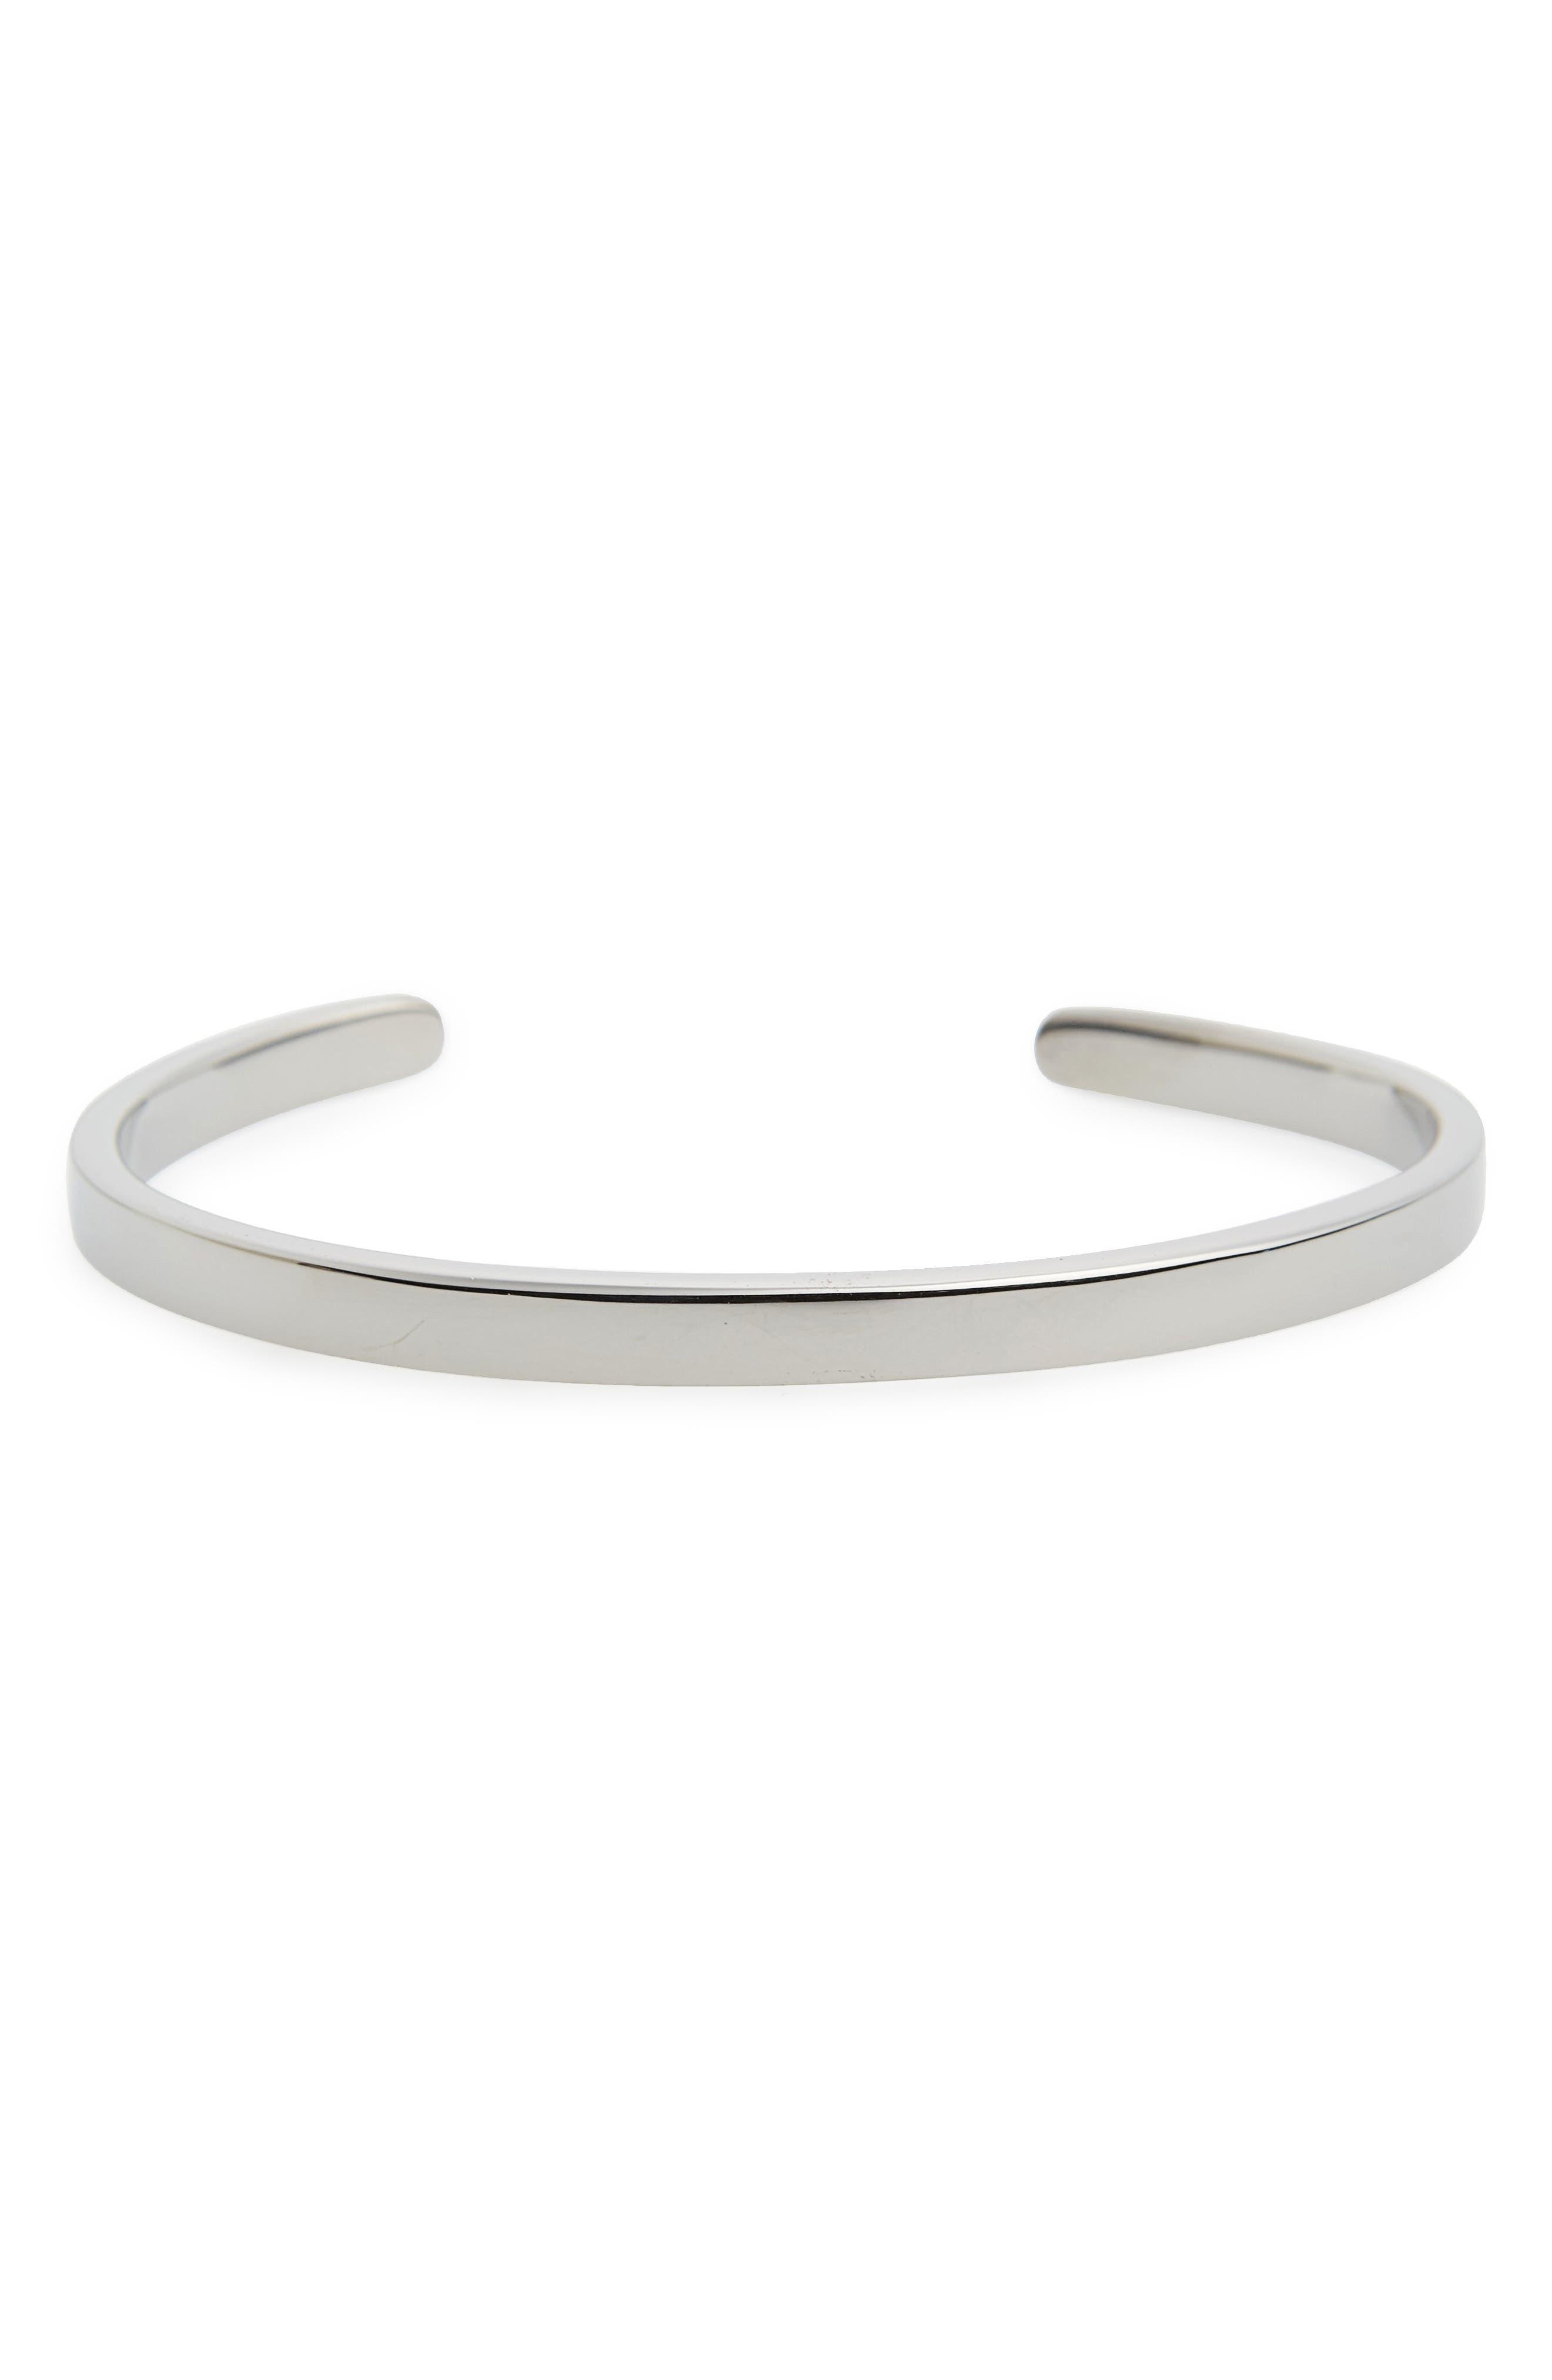 Singular Cuff,                         Main,                         color, Polished Black/ Silver